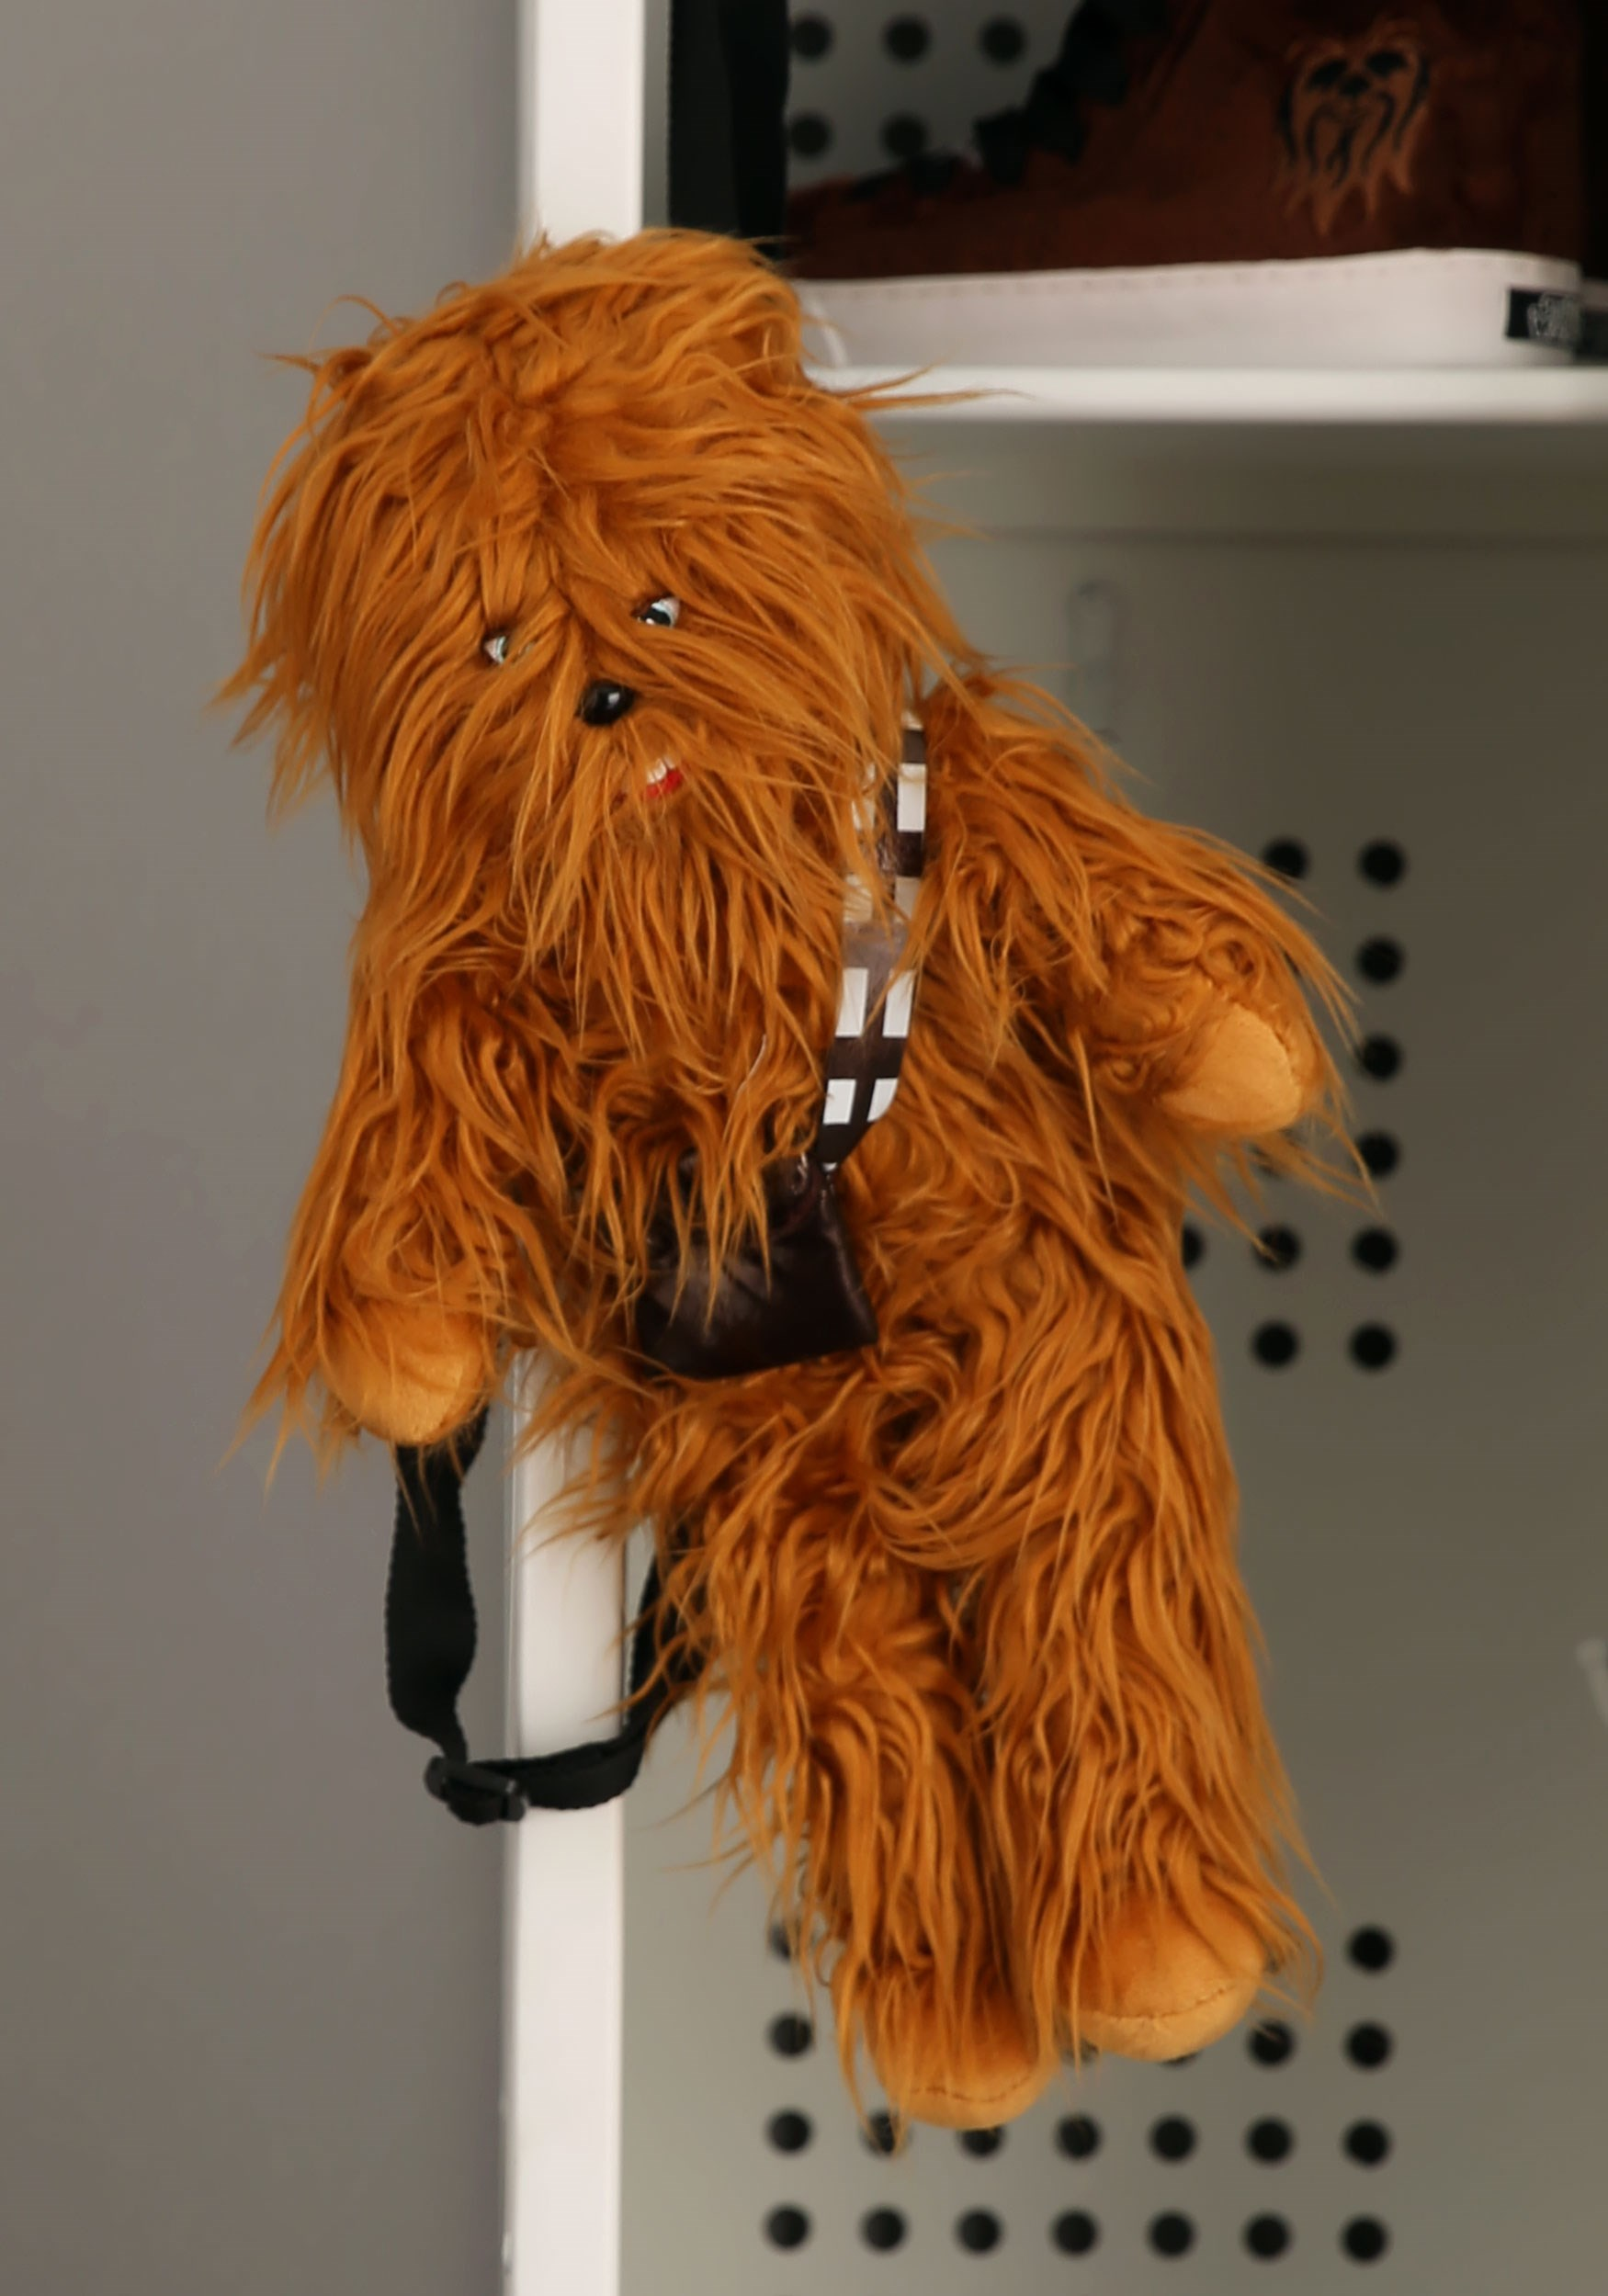 Star Wars Chewbacca Stuffed Figure 17